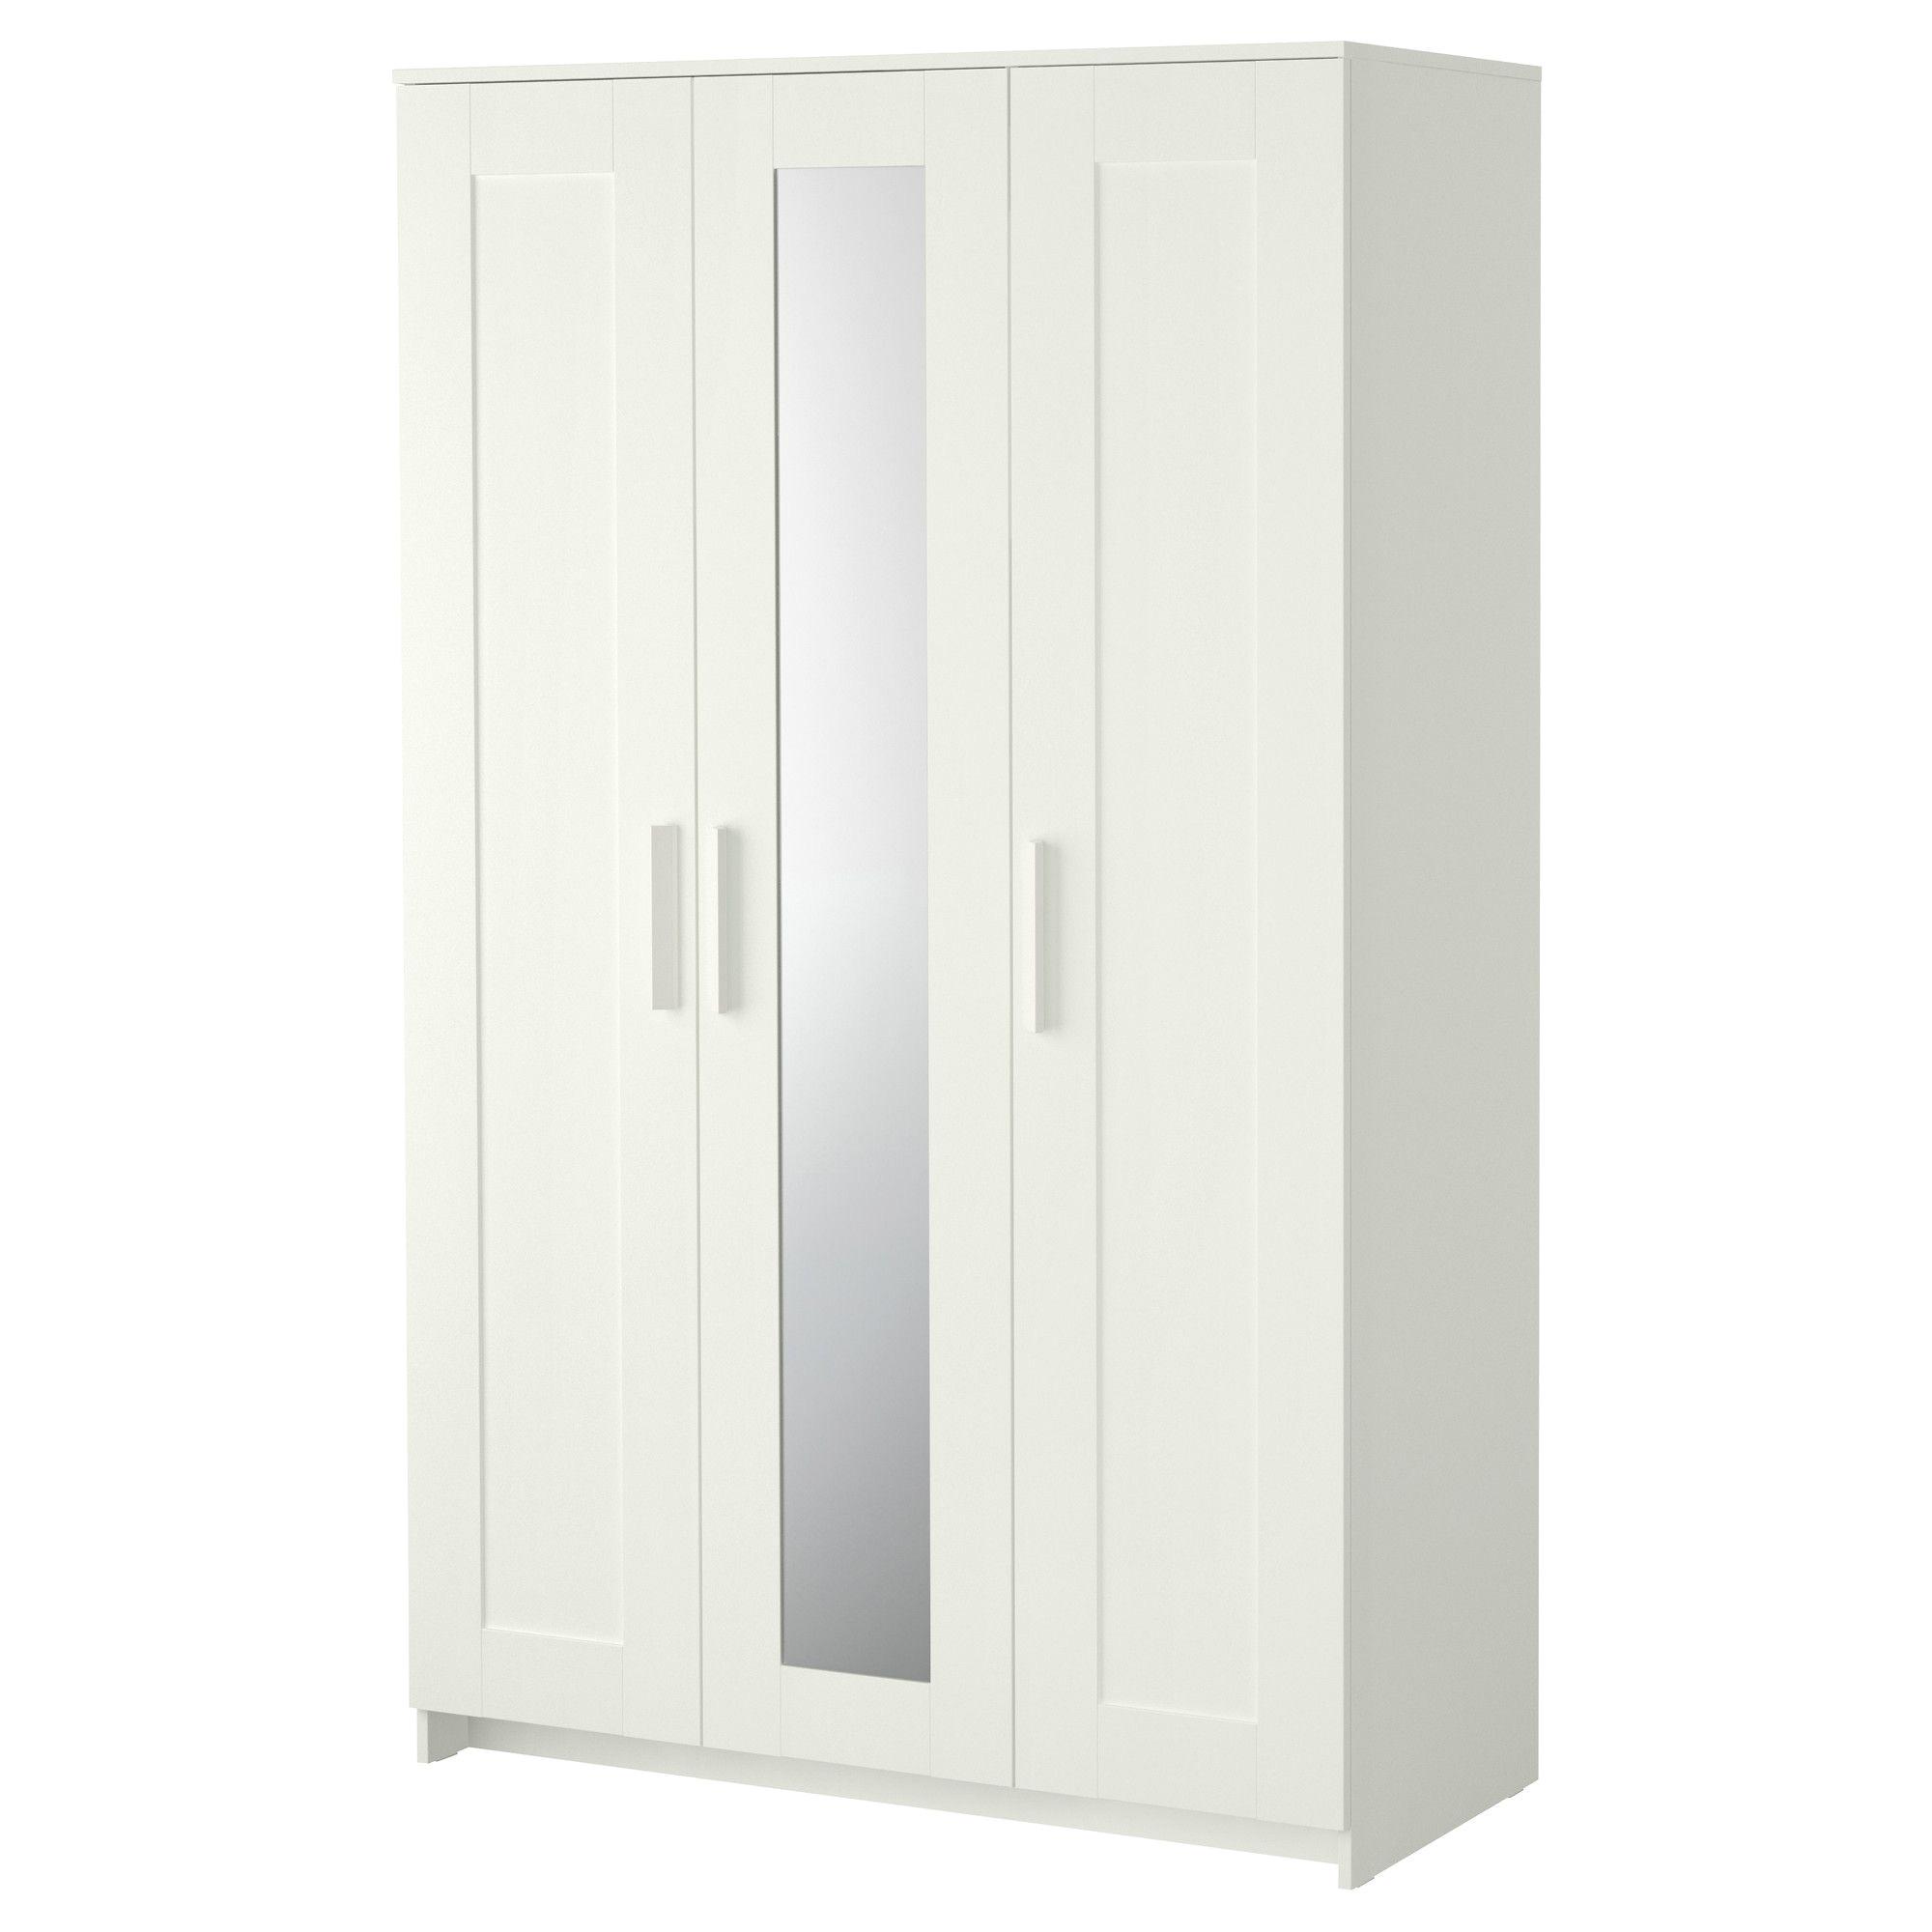 brimnes wardrobe with 3 doors white ikea